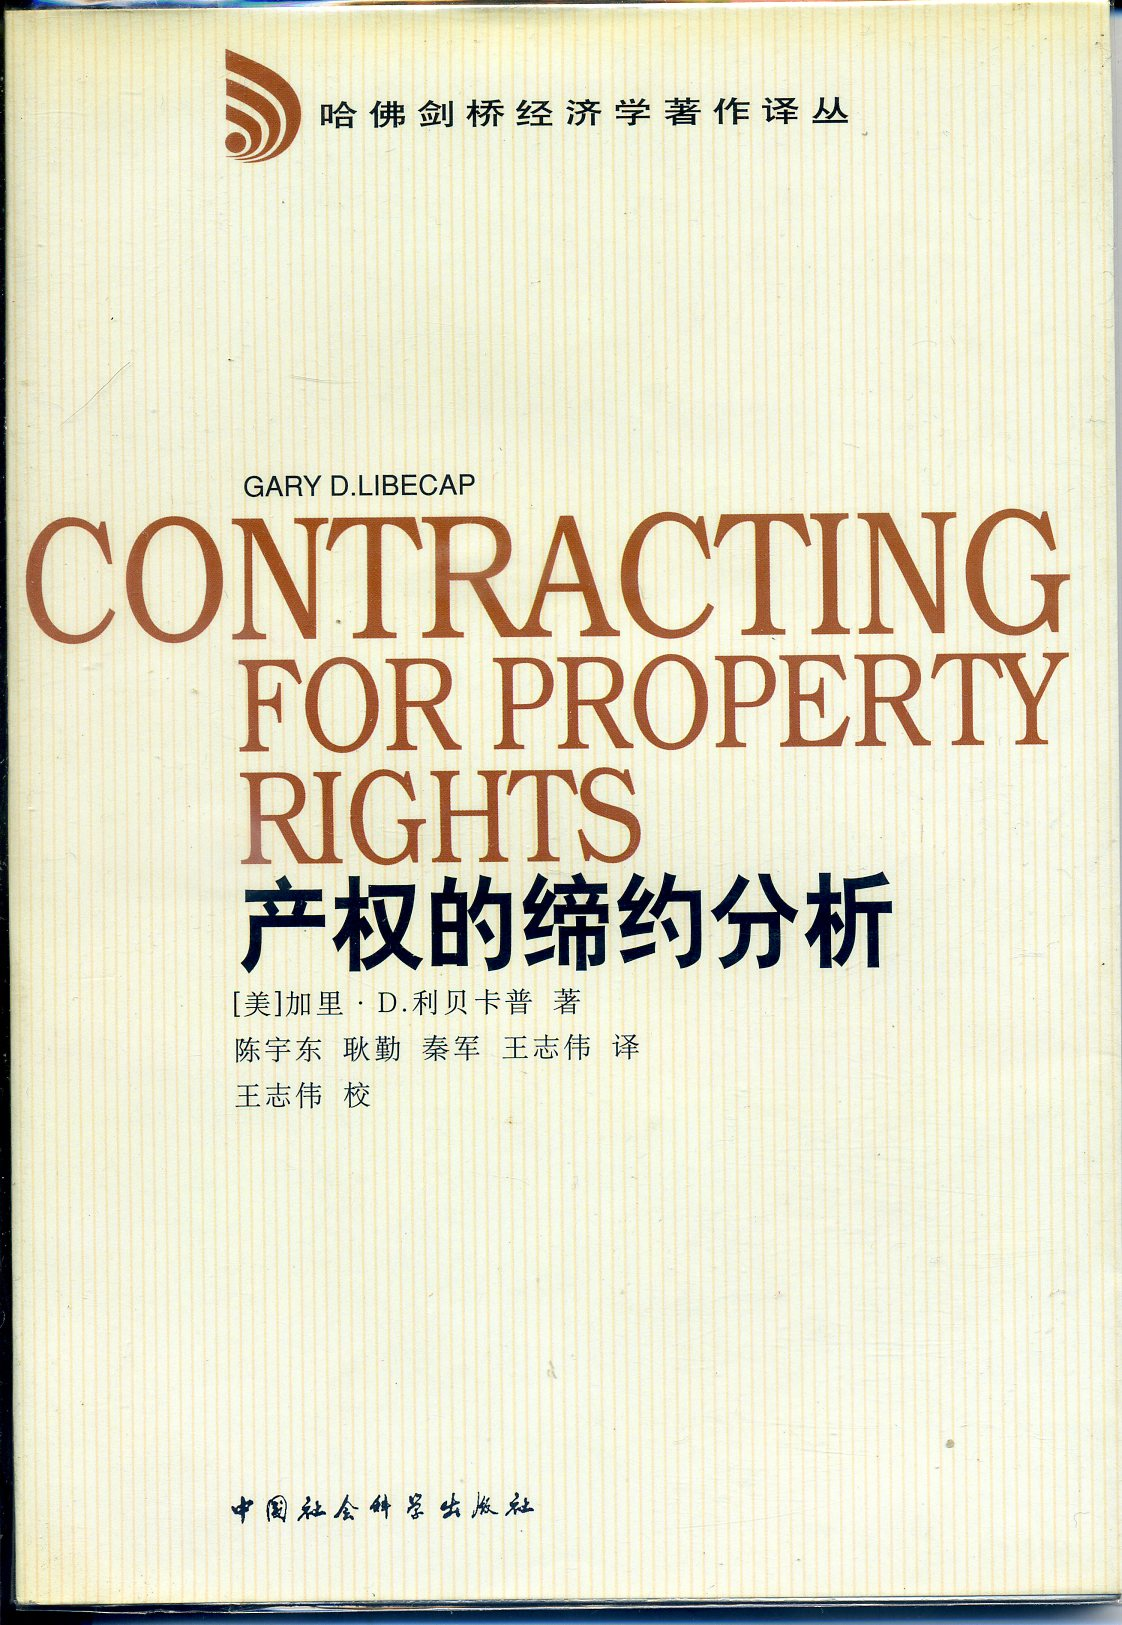 产权的缔约分析/哈佛剑桥经济学著作译丛/Contracting for Property Rights